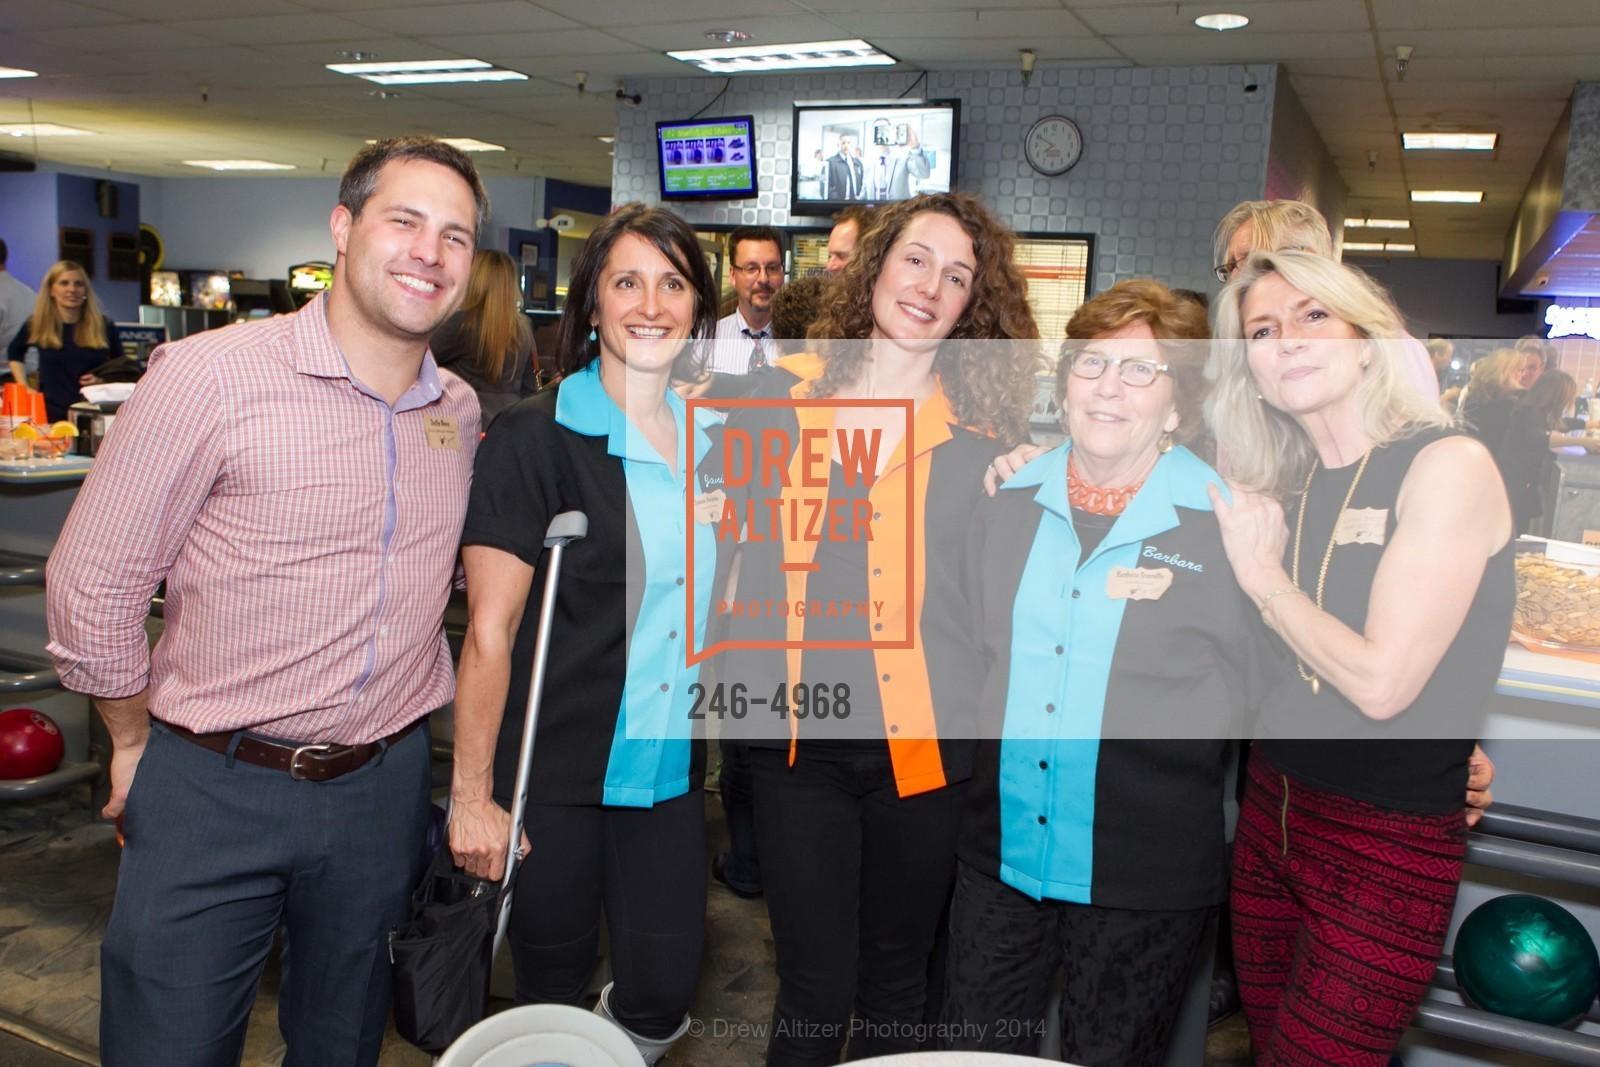 Dustin Moore, Janine Aurichio, Katherine Cro, Barbara Scavullo, Kathy Best, Photo #246-4968